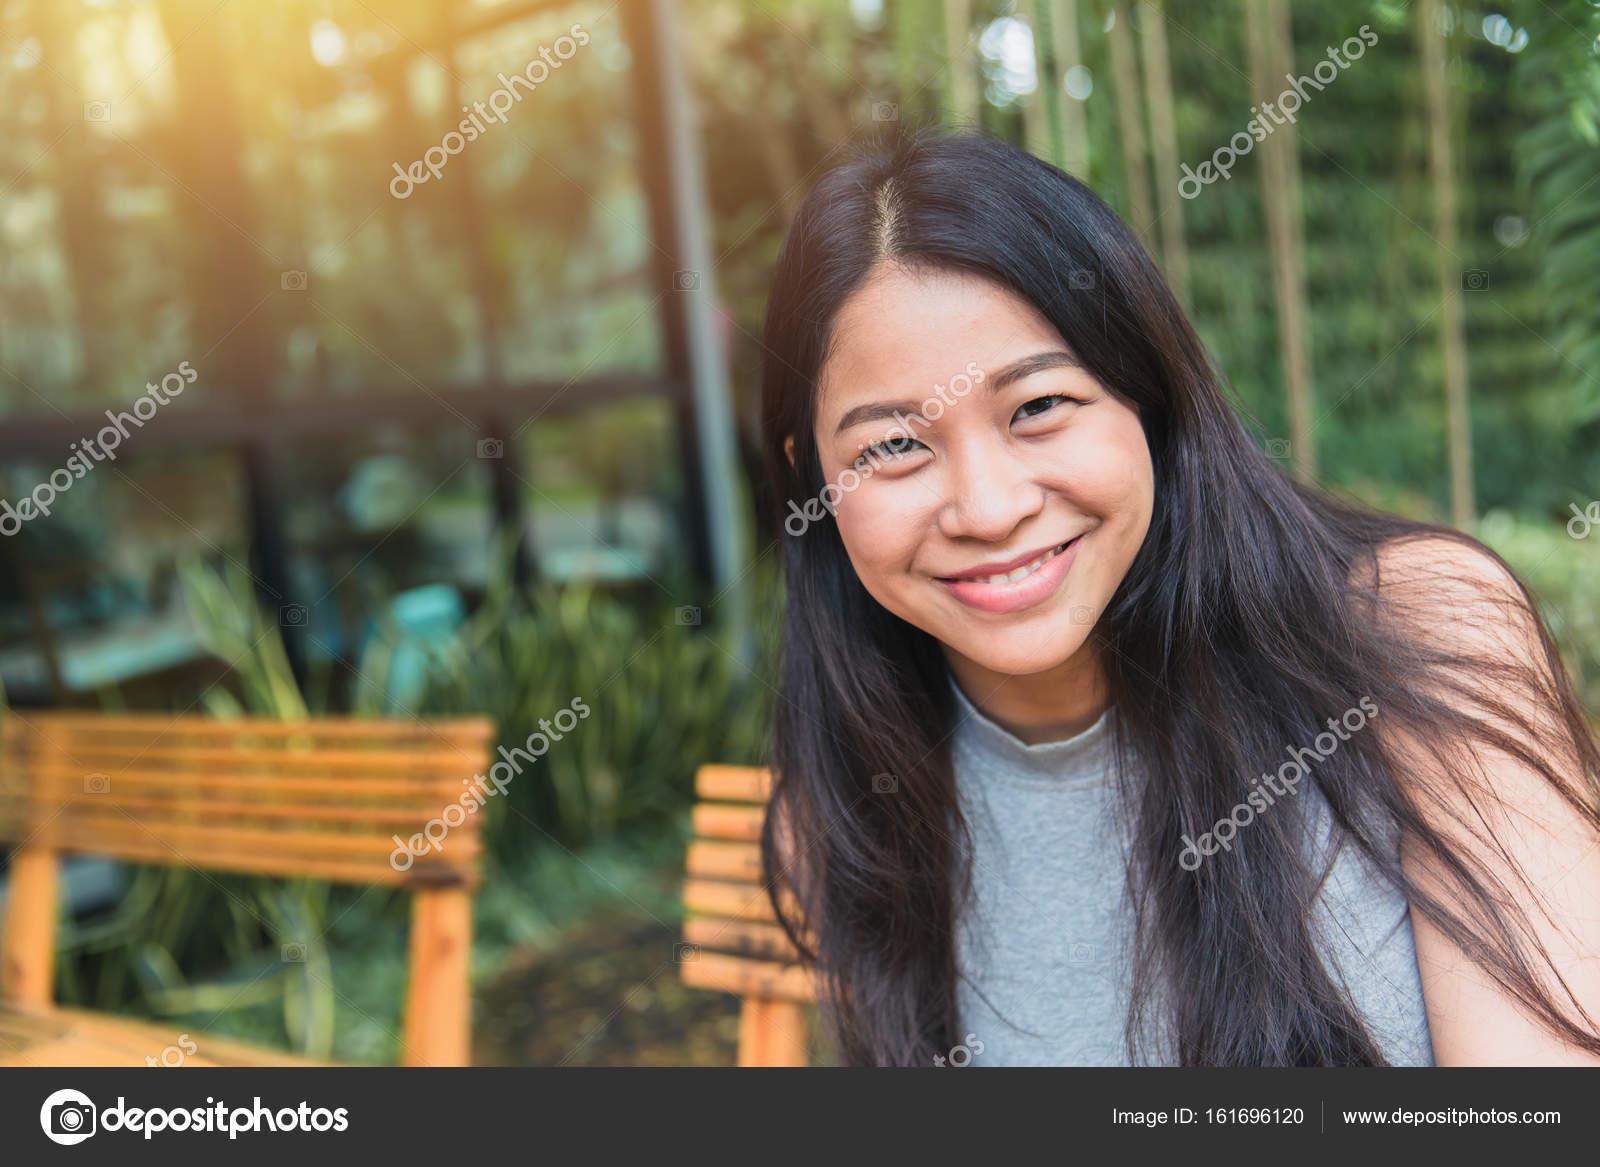 Portait Asian Women Black Long Hair Adult Happy Smile Enjoy In The